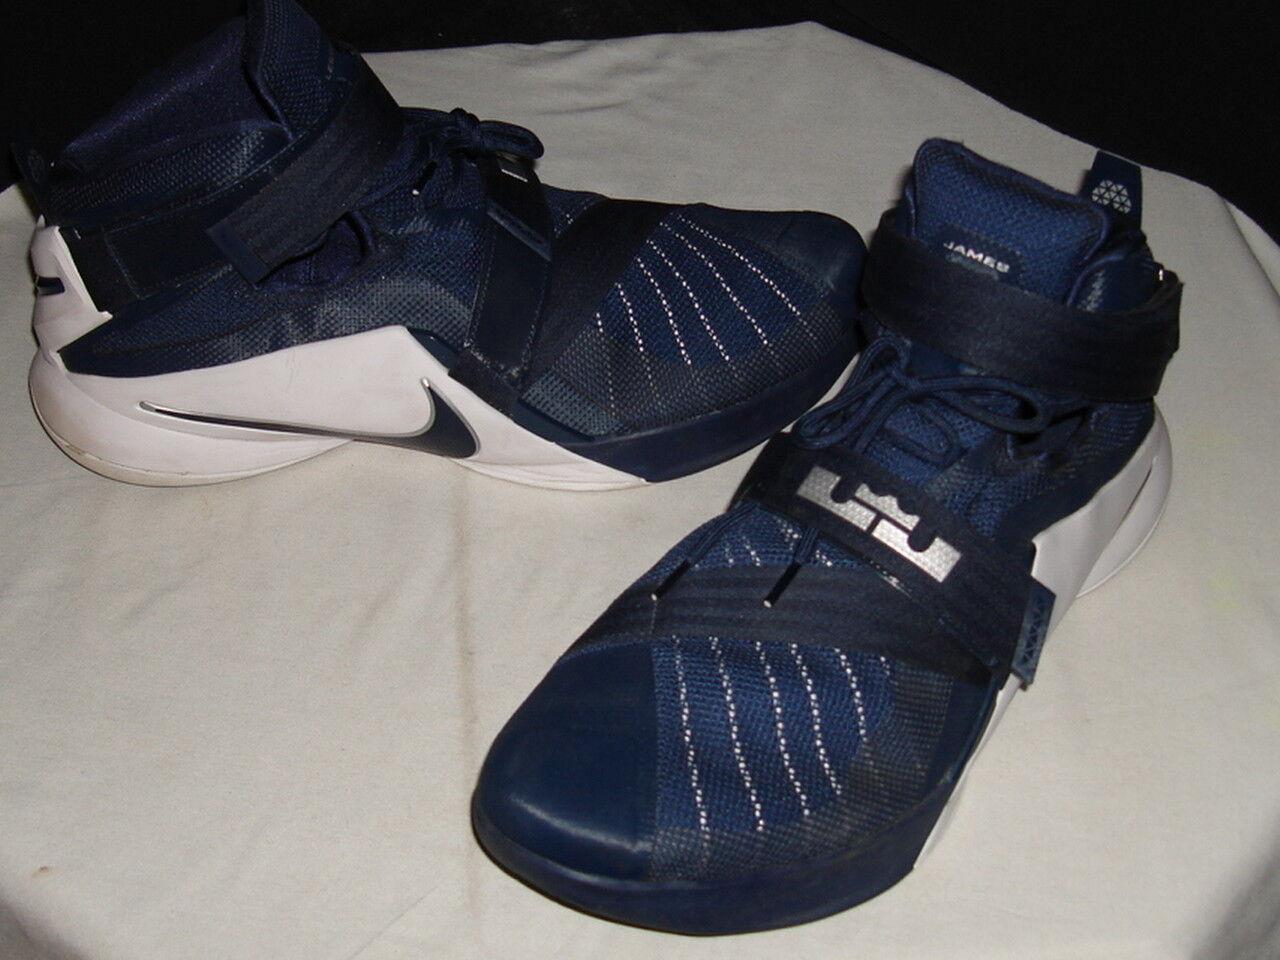 Nike Zoom Air LeBron / 3 soldado 9 Azul / LeBron Blanco Basketball Zapatos SZ 18 a41158